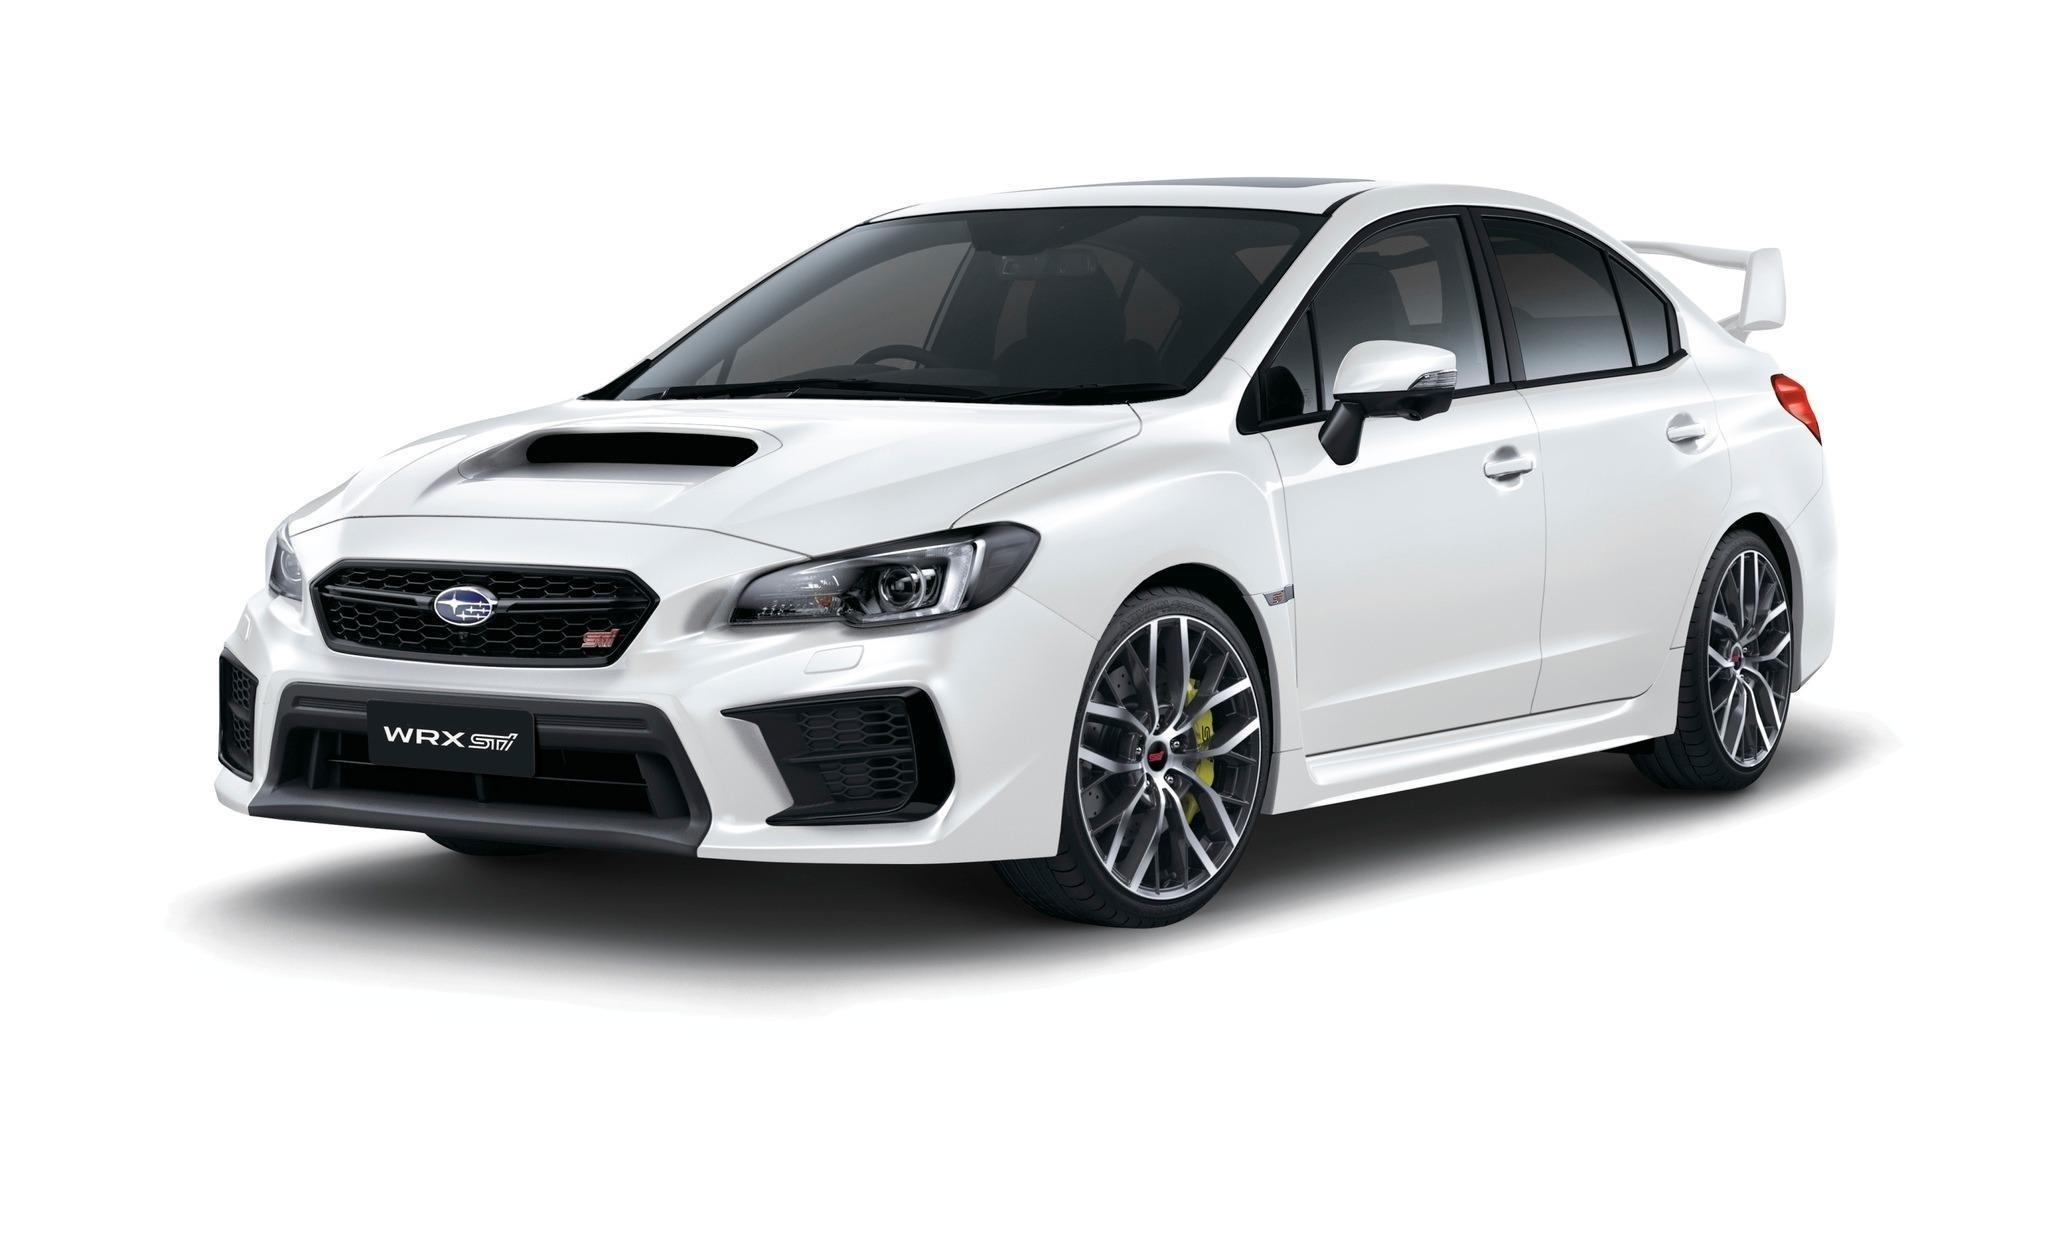 2021 Subaru WRX STi PREMIUM MY21 / 6 Speed Manual / Sedan / 2.5L / 4 Cylinder TURBO / Petrol / 4x4 / 4 door / Model Year '21 August release 07WZ21